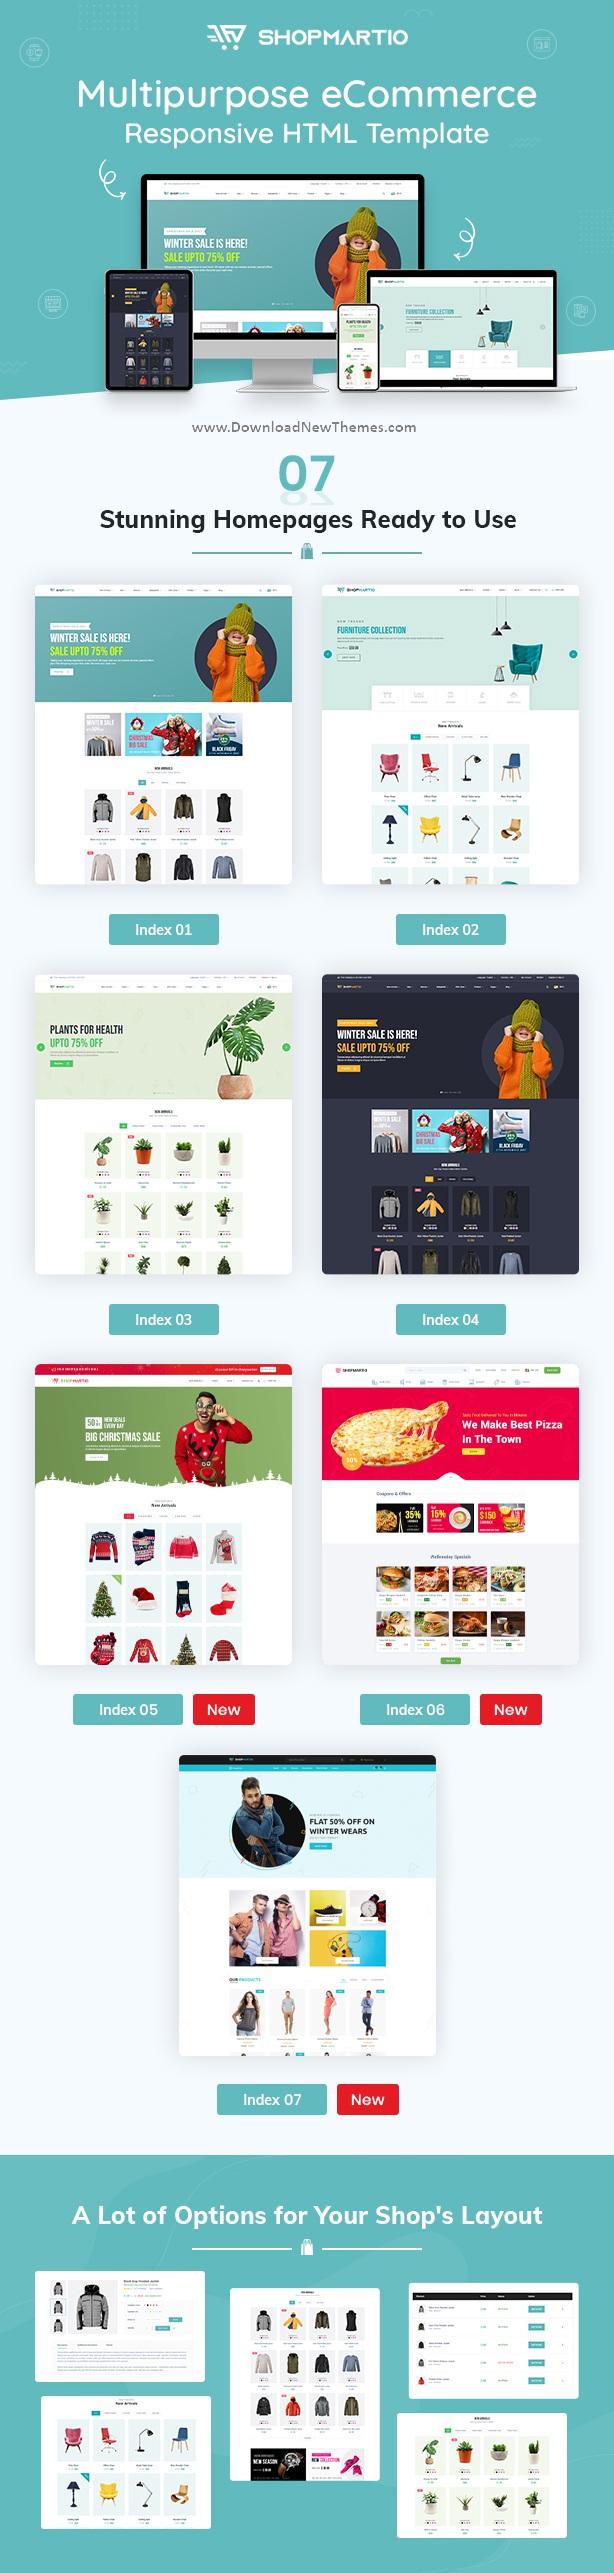 ShopMartio - Multipurpose eCommerce Responsive HTML Template